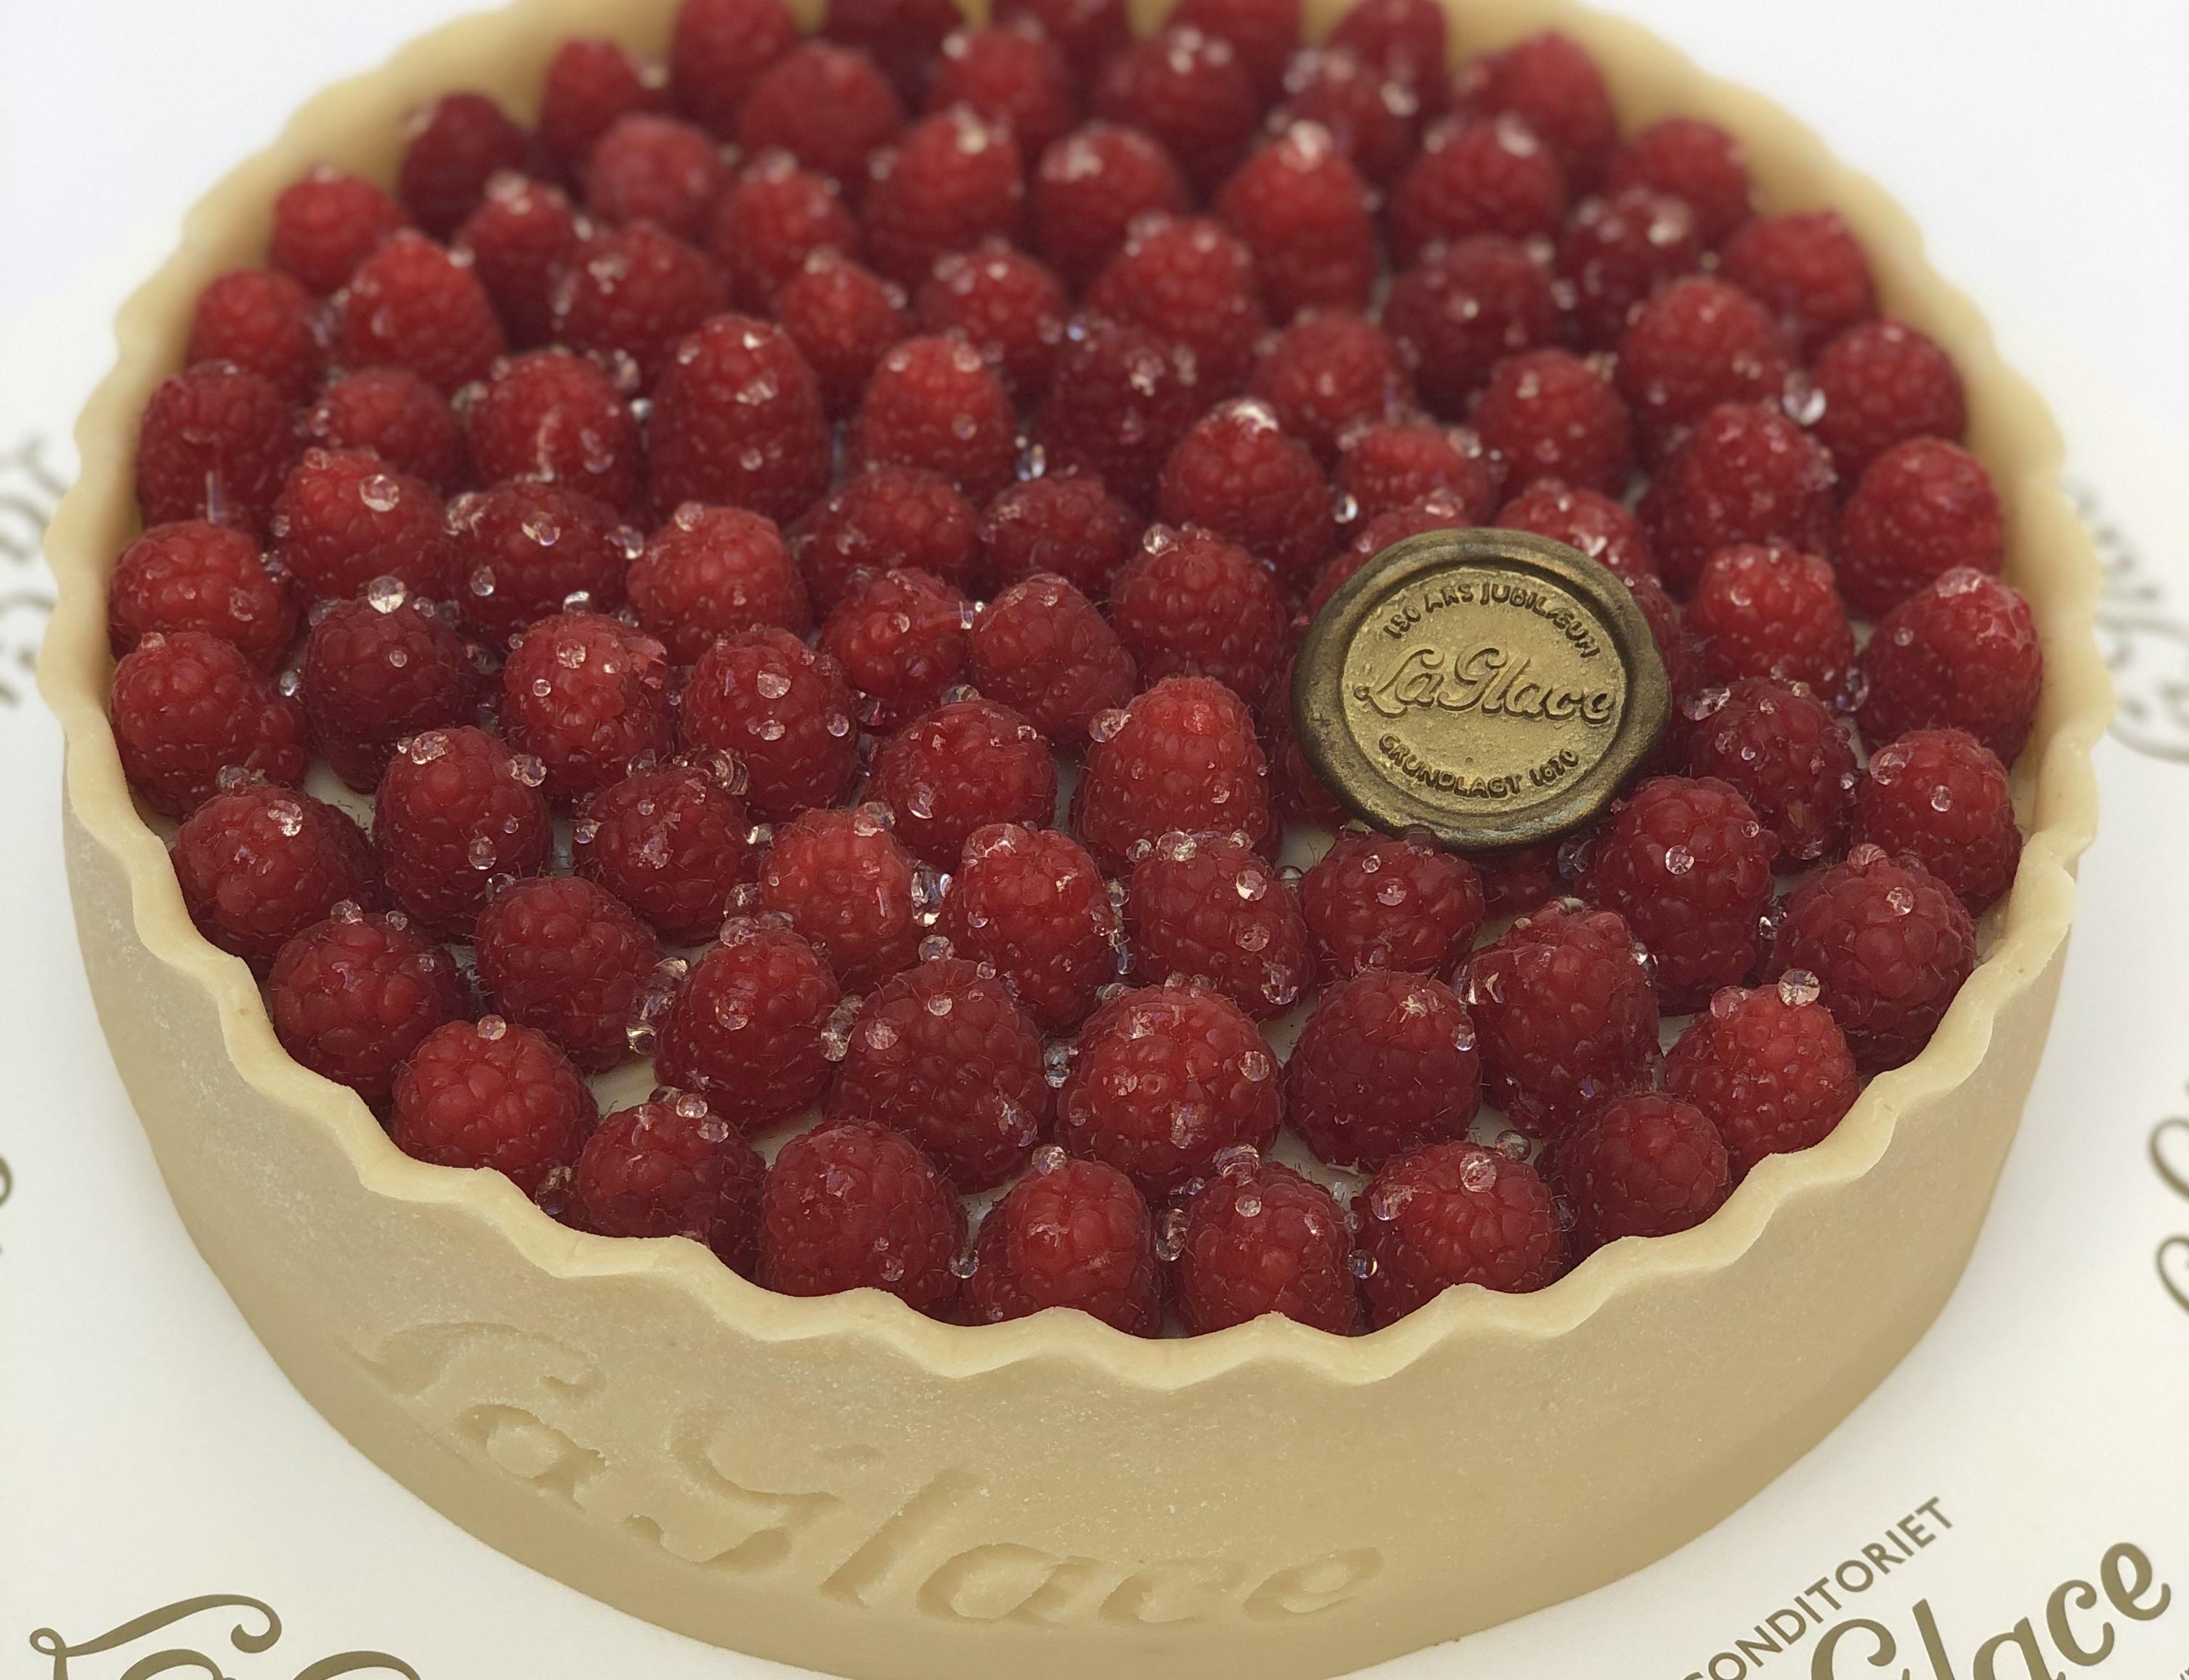 Tærte med friske bær